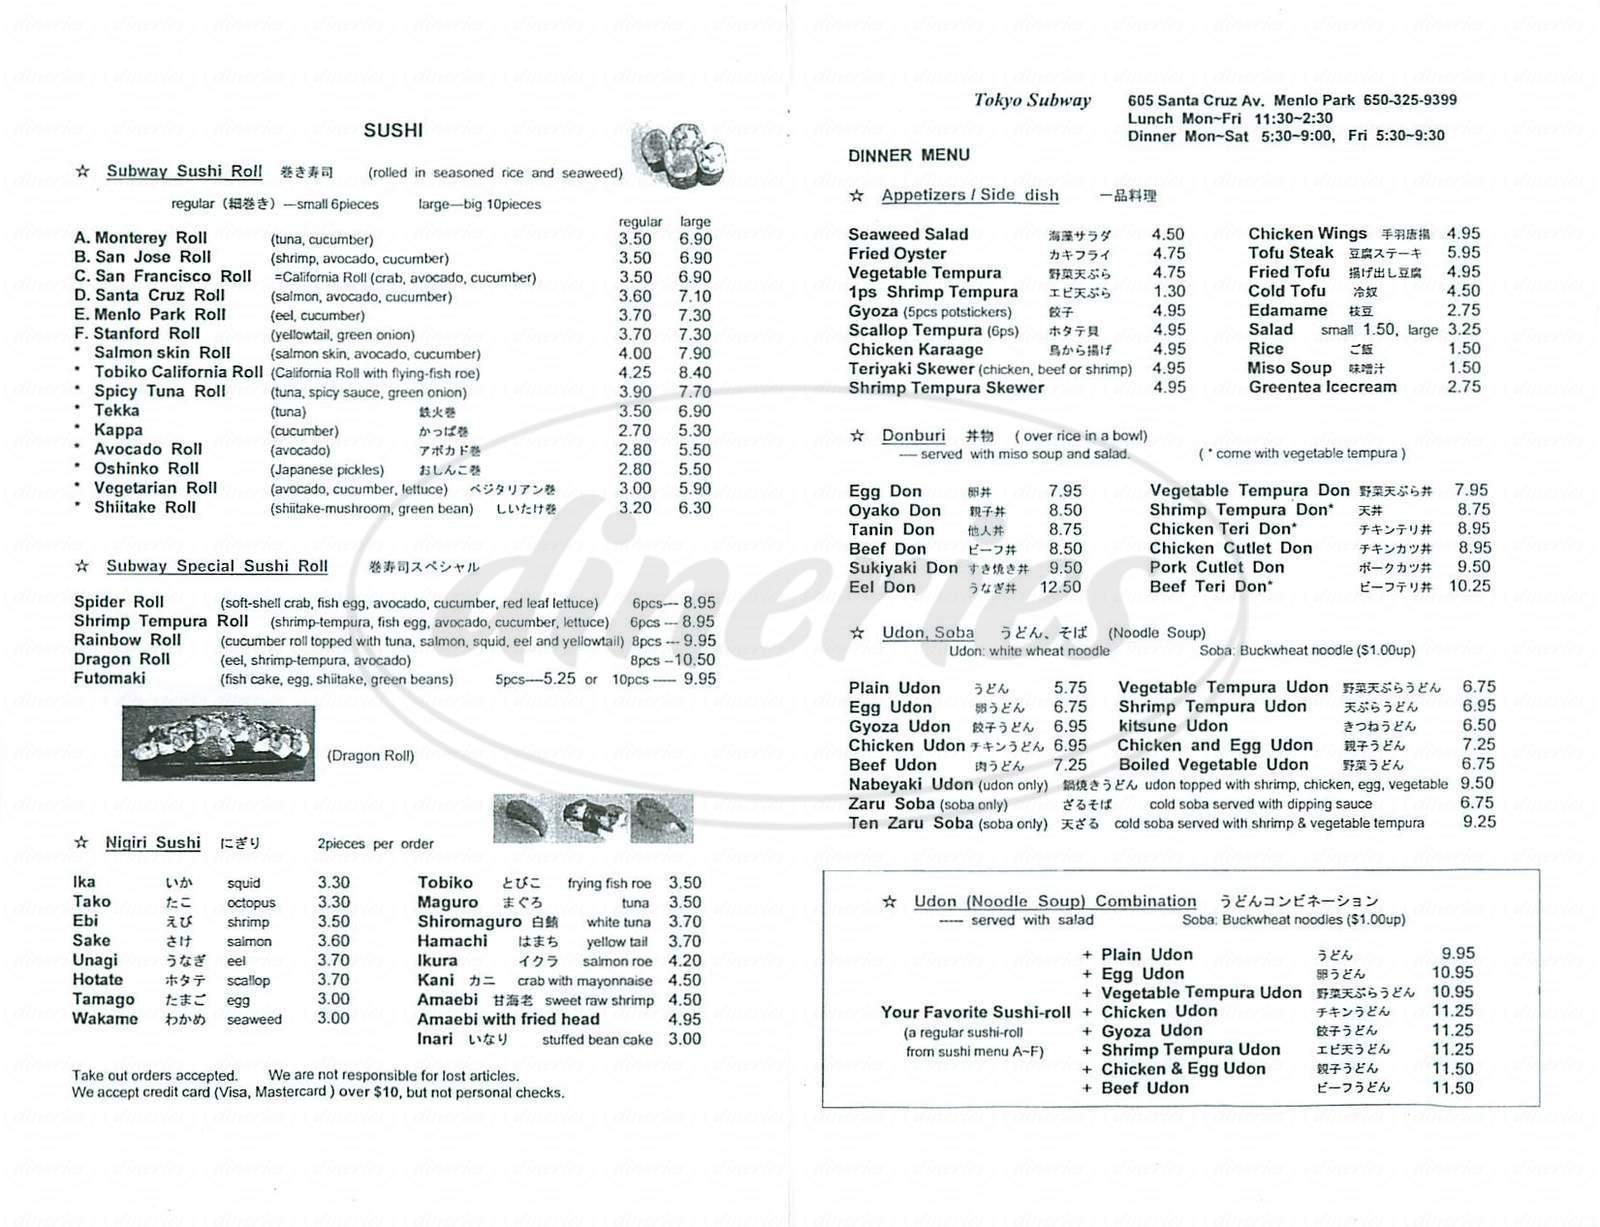 menu for Tokyo Subway